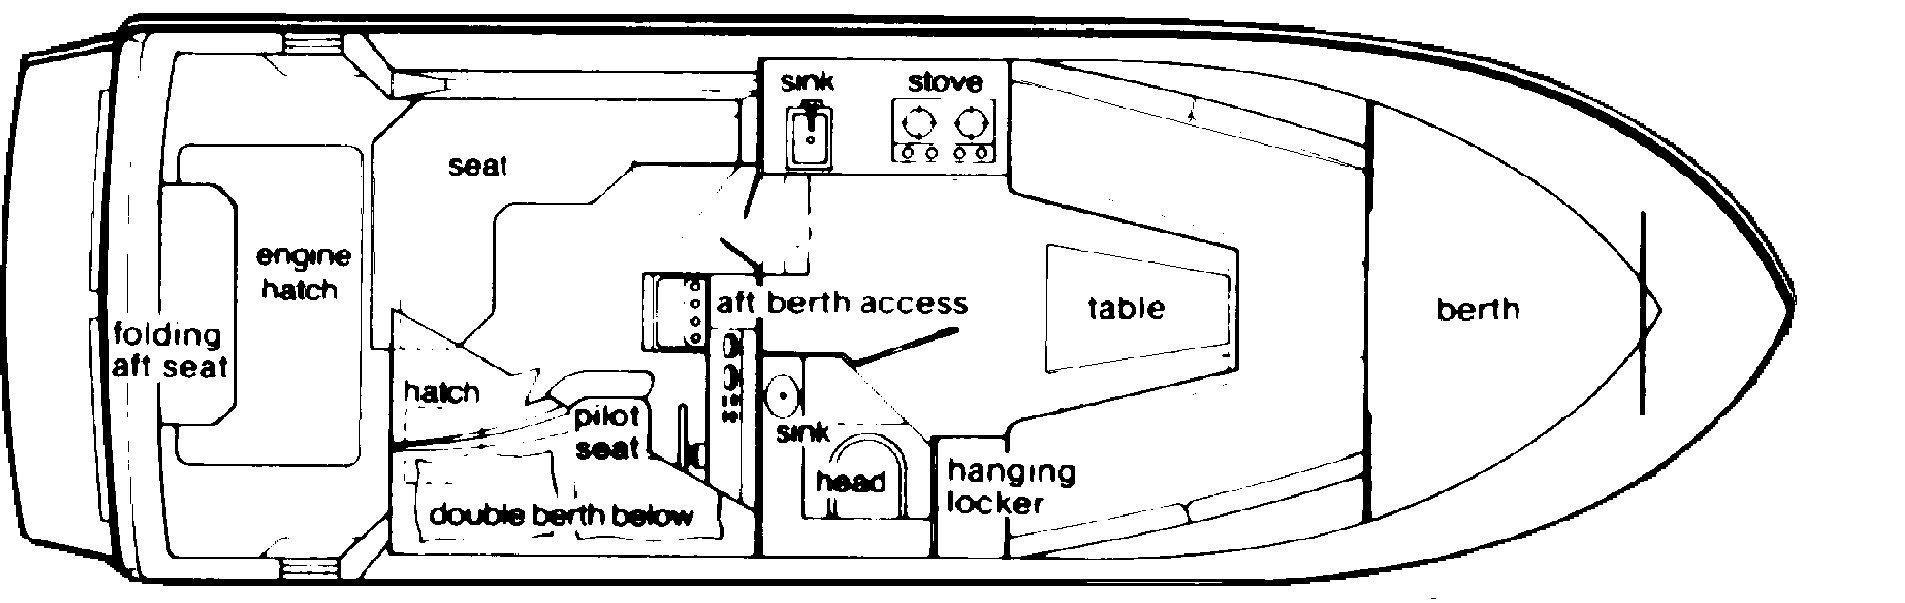 2850-2855 Sunbridge Floor Plan 2